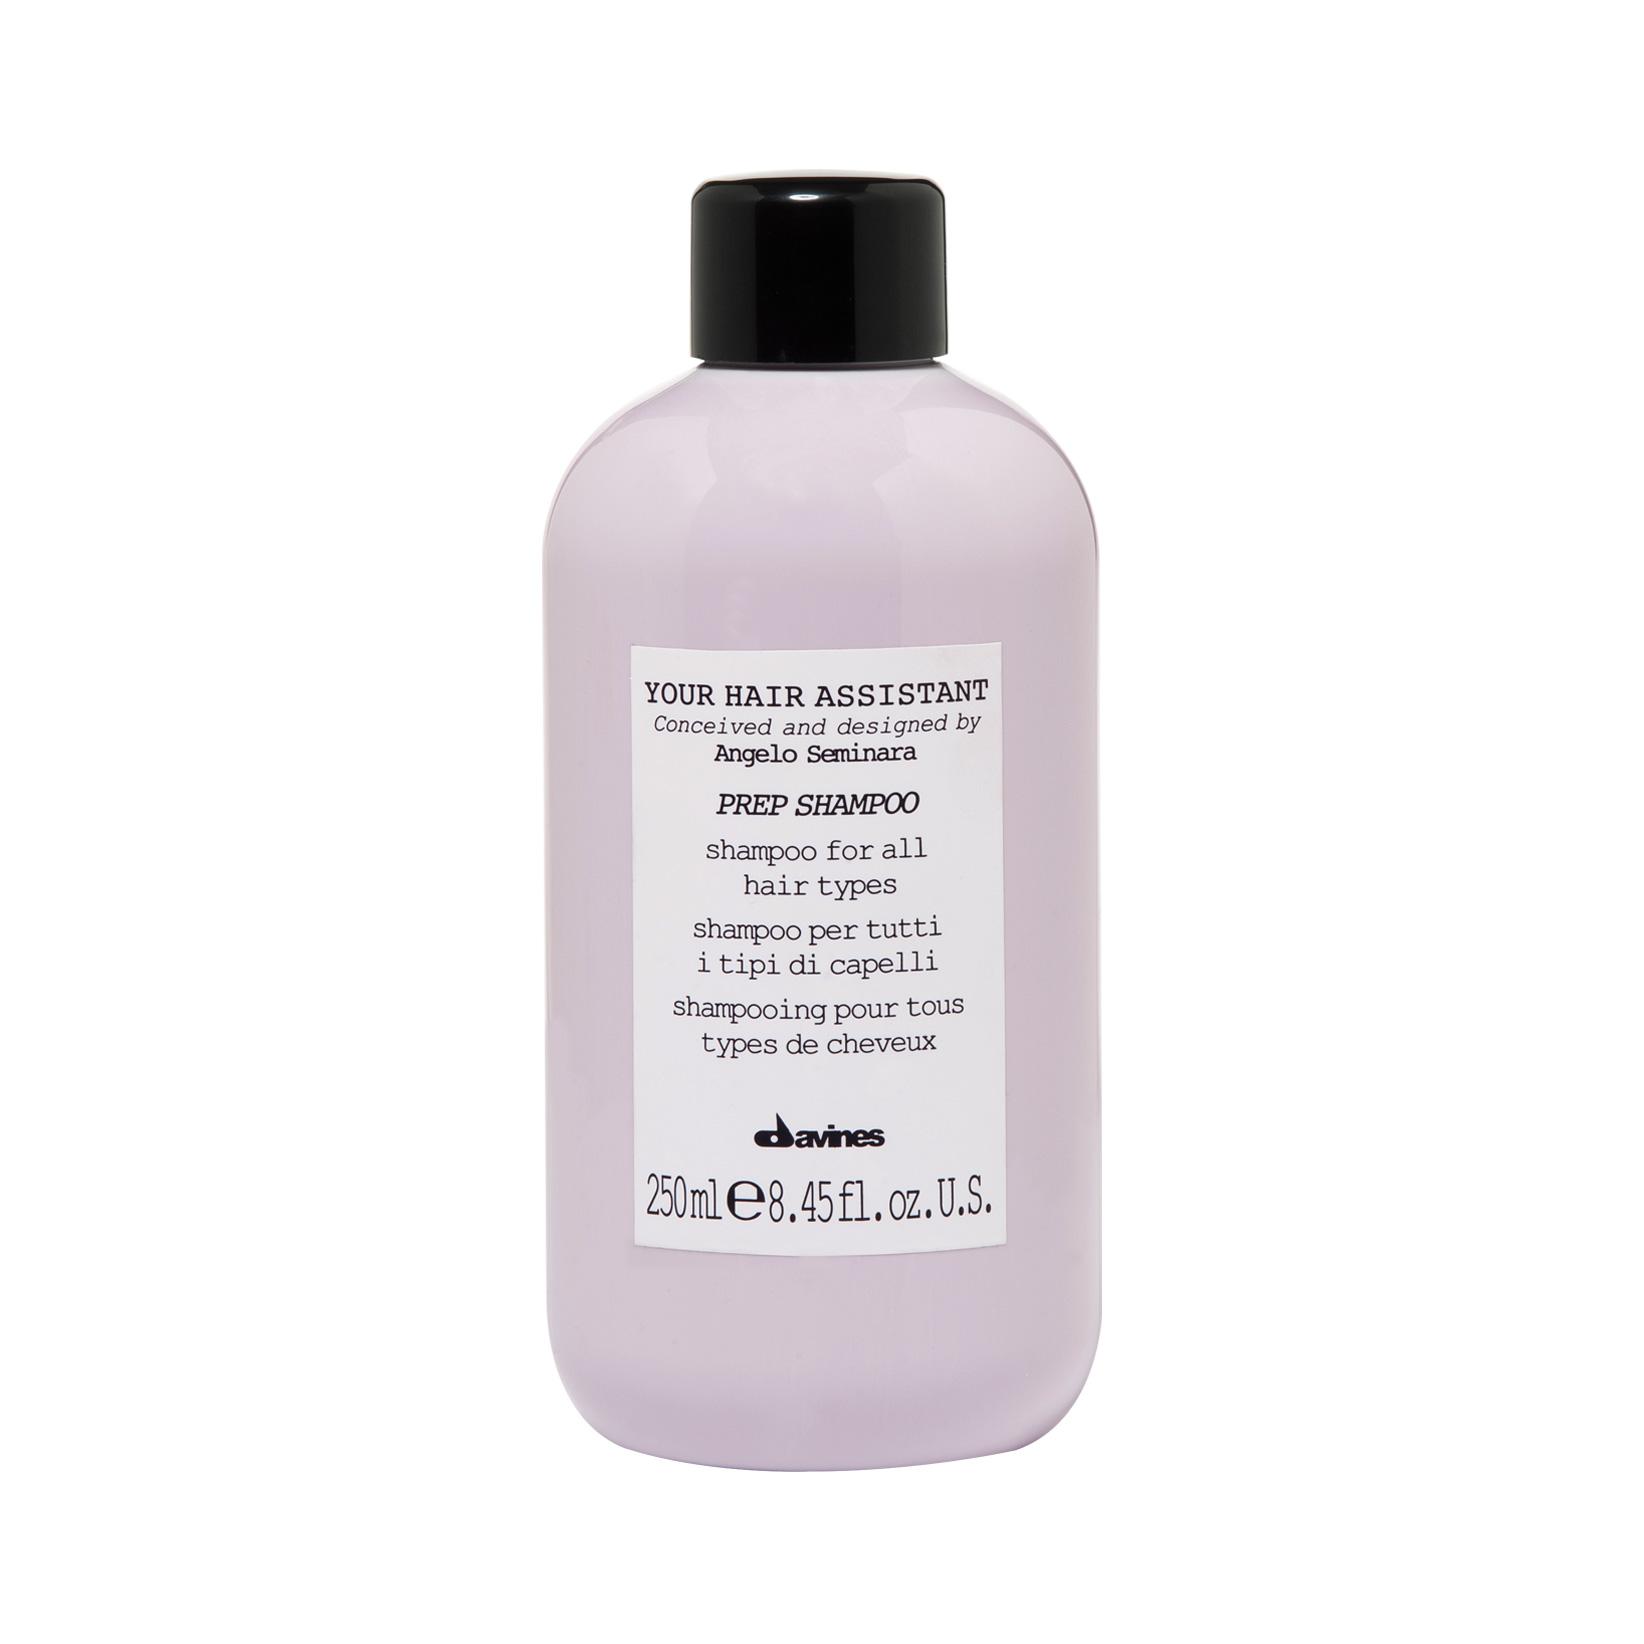 Prep_Shampoo